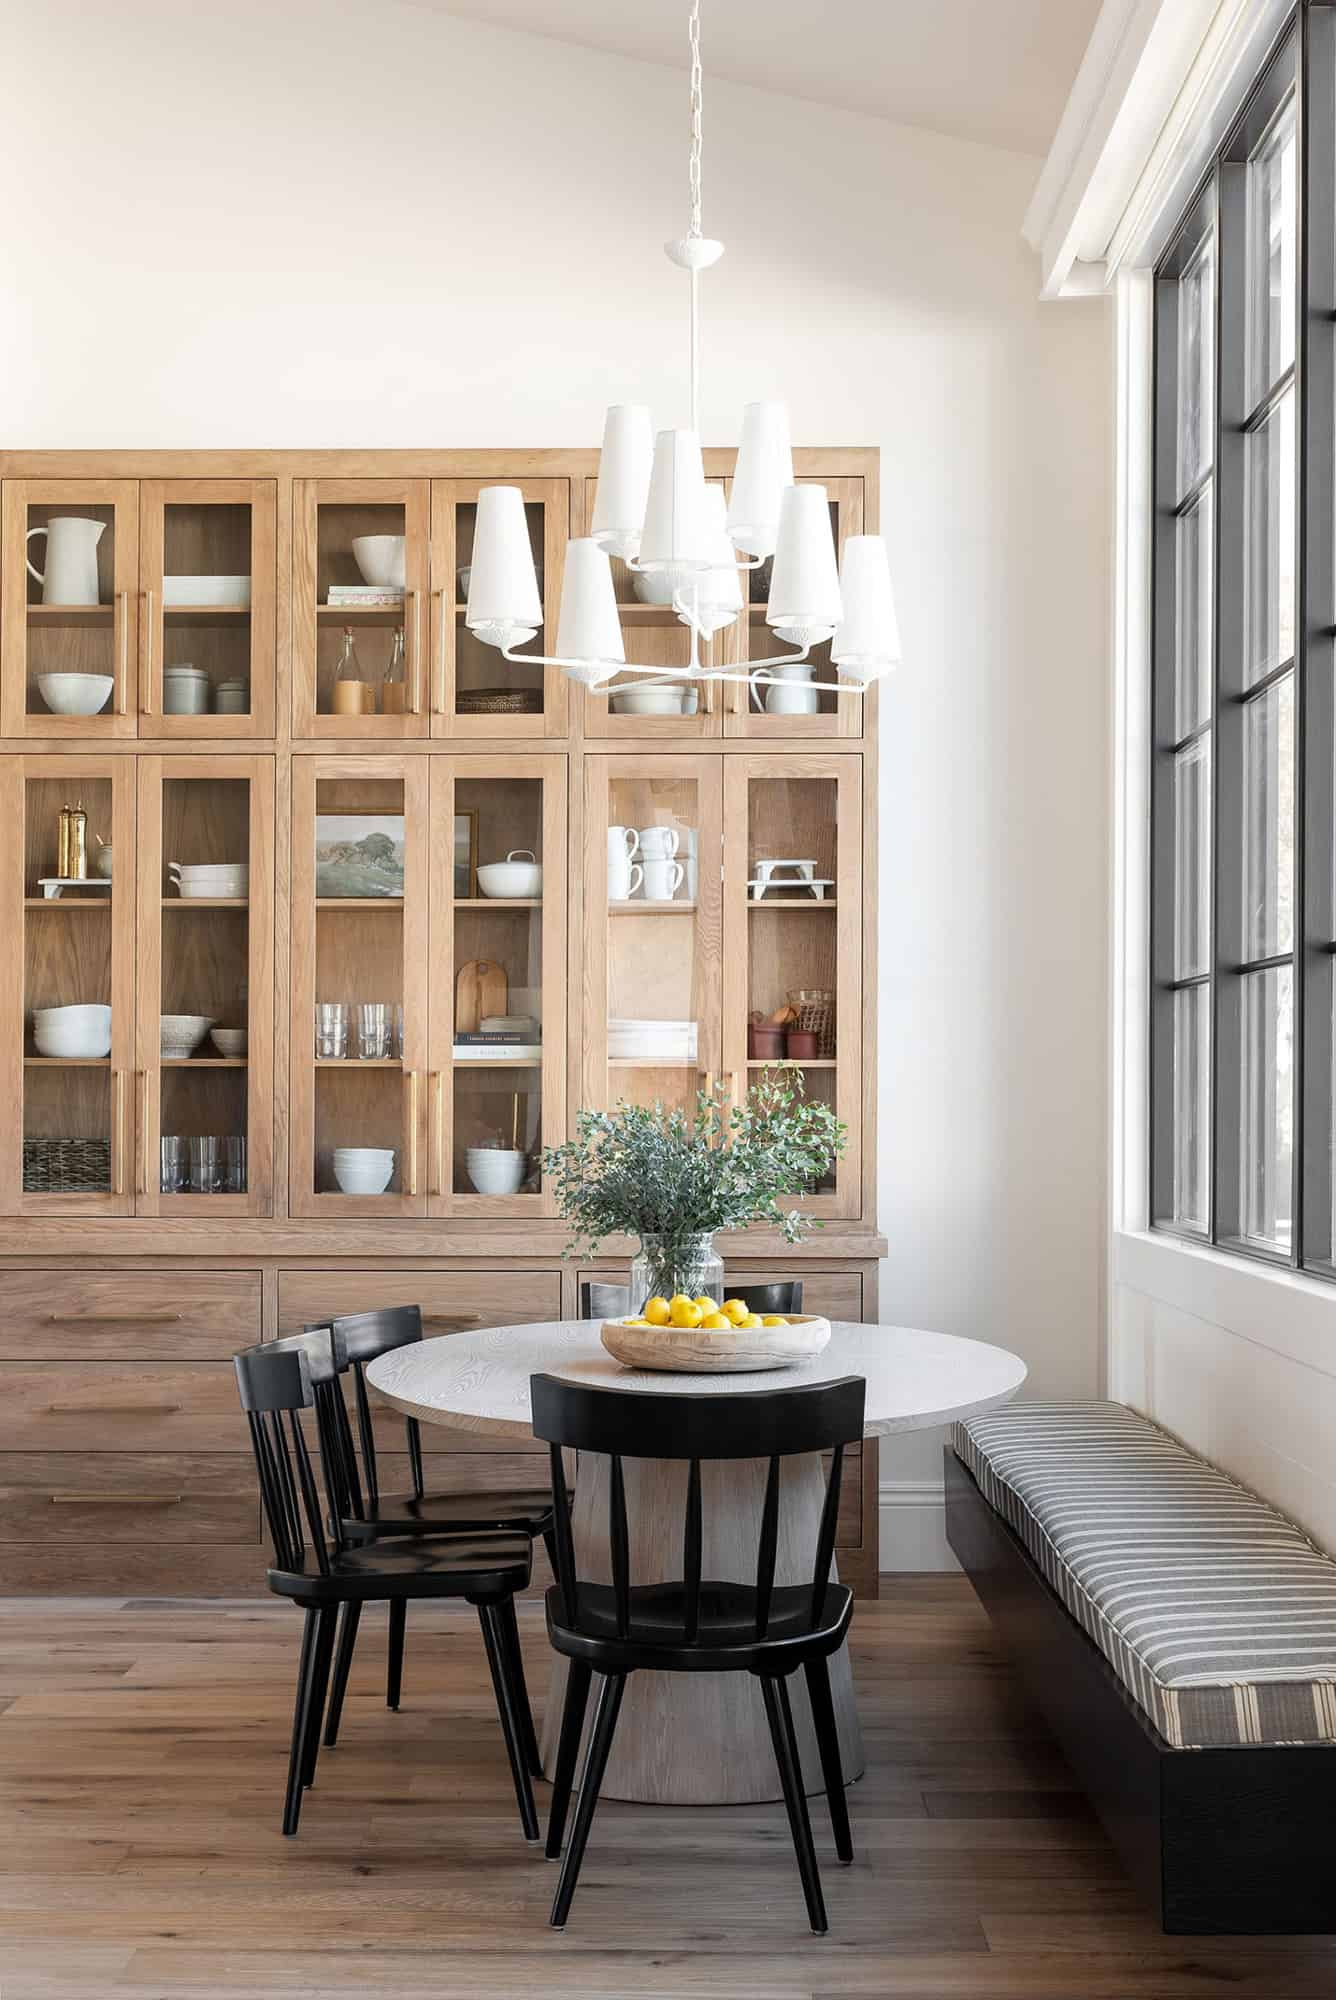 rambler-style-house-kitchen-breakfast-nook